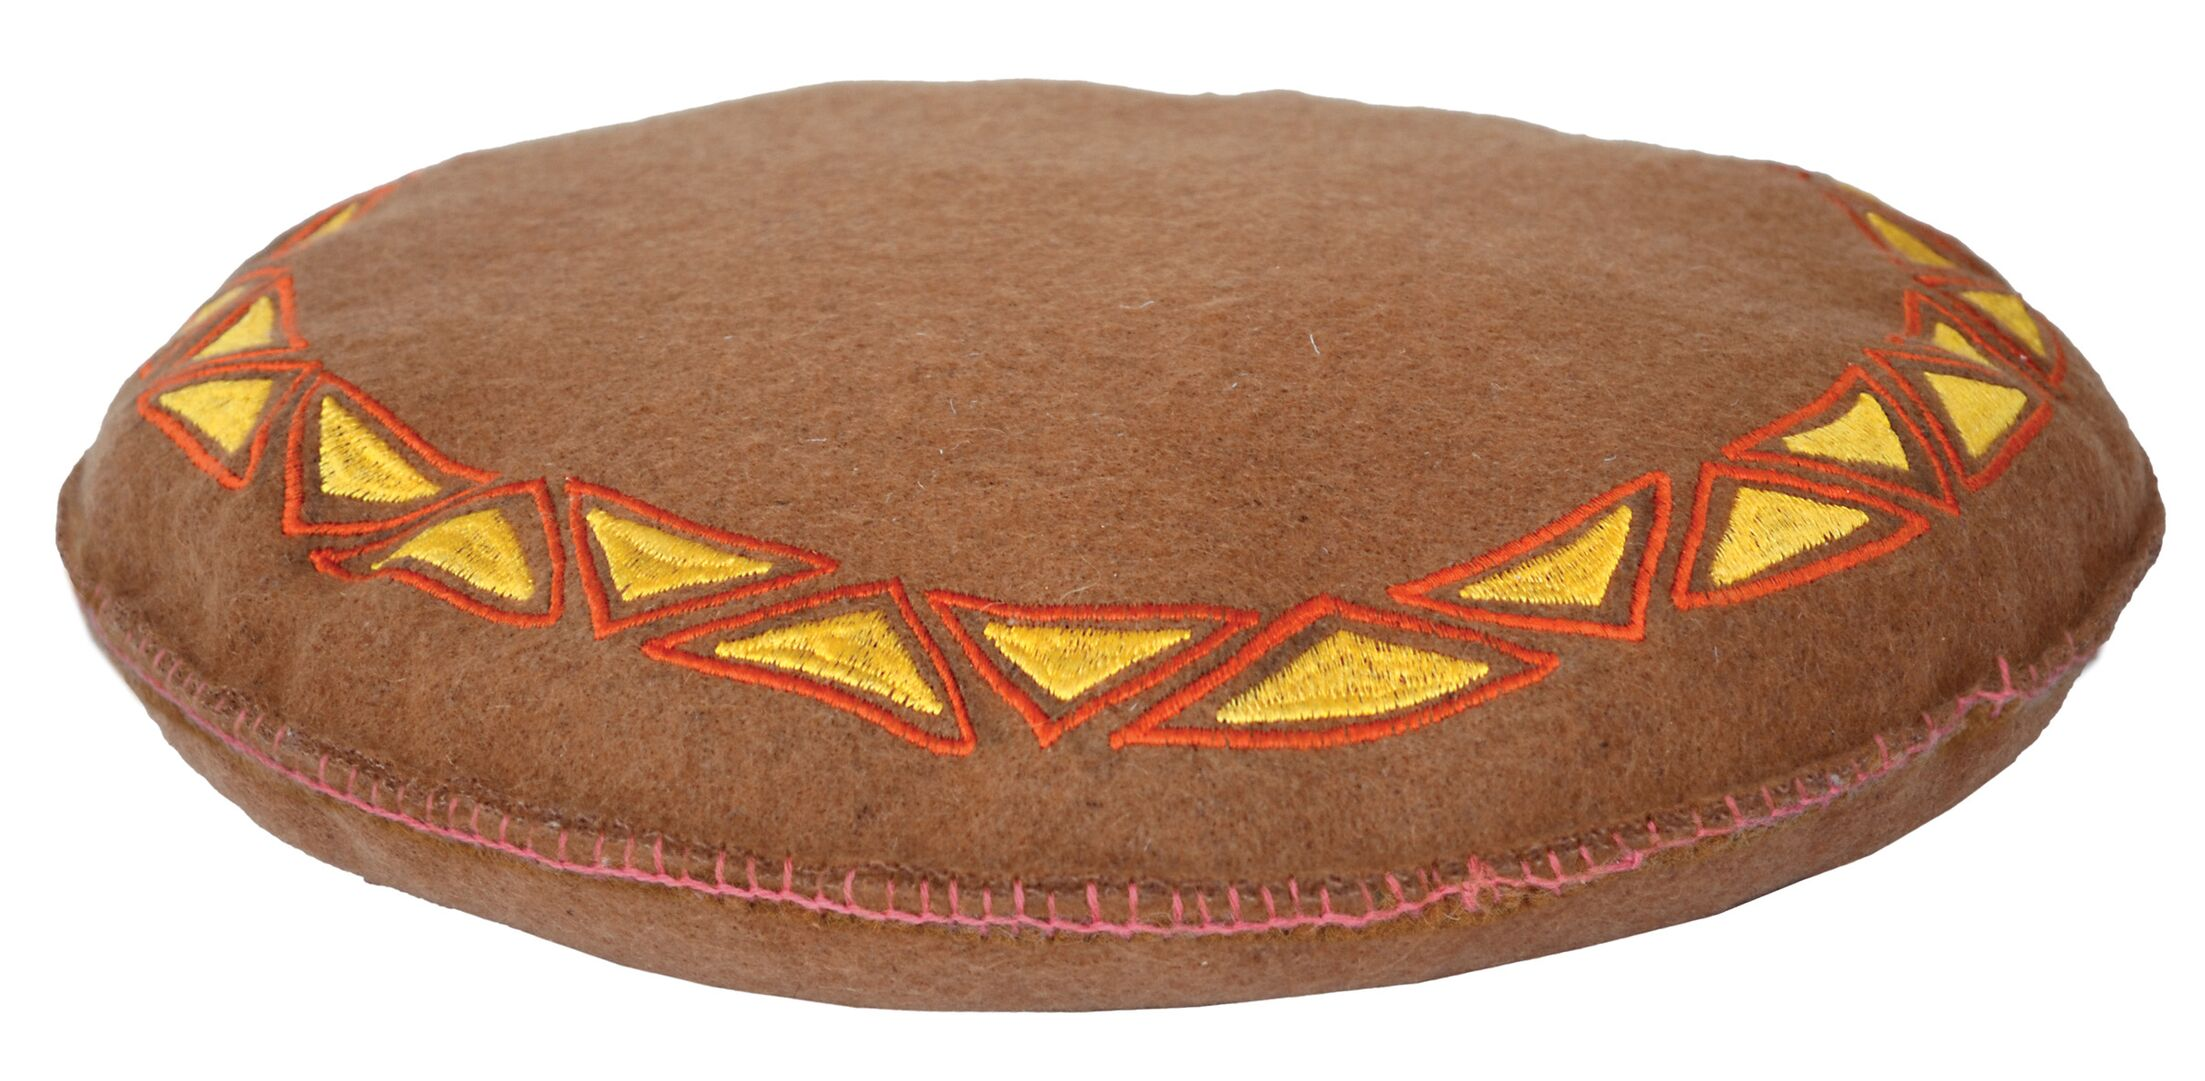 Felt Seater Embroidery Cushion (Set of 2)